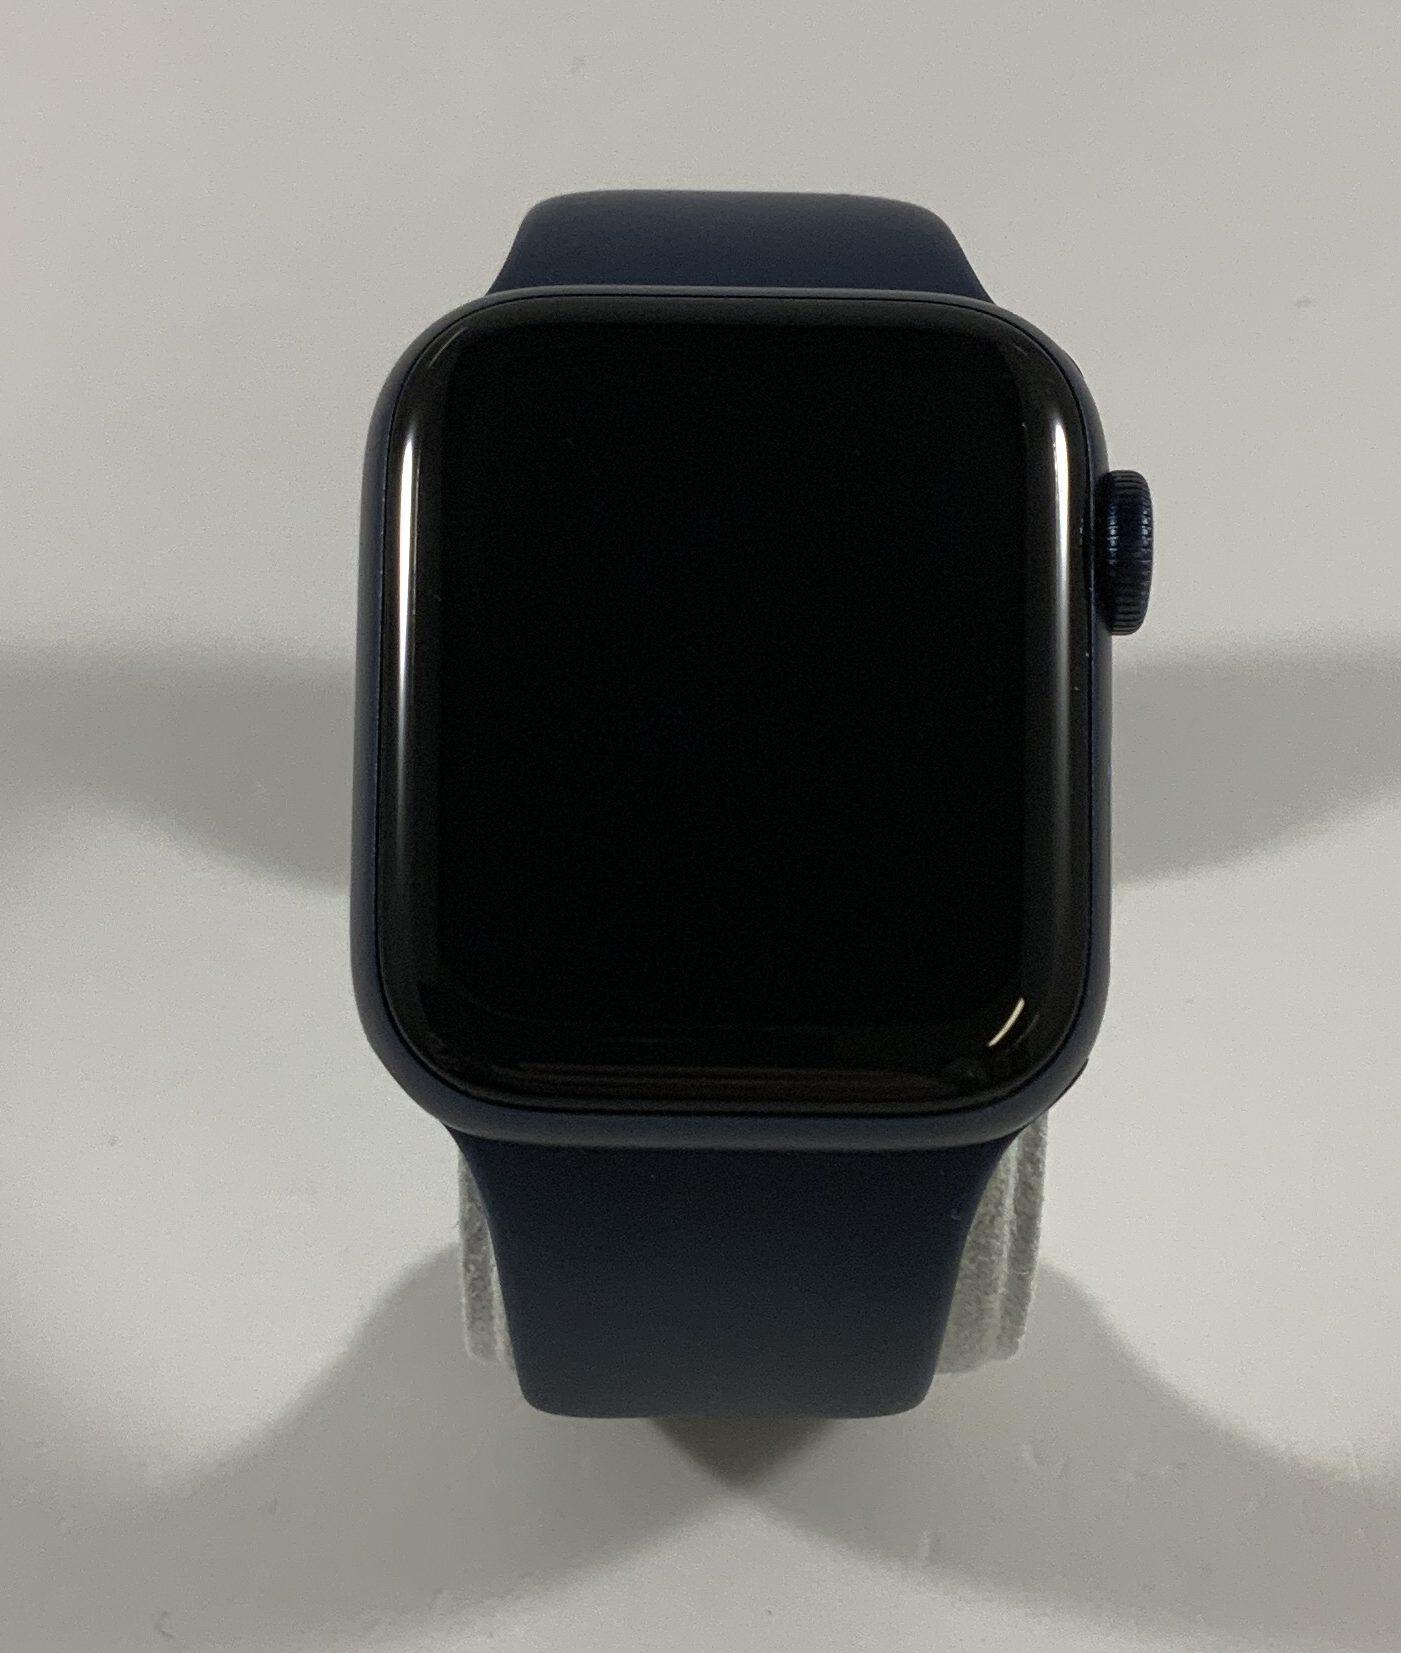 Watch Series 6 Aluminum (40mm), Blue, Afbeelding 1